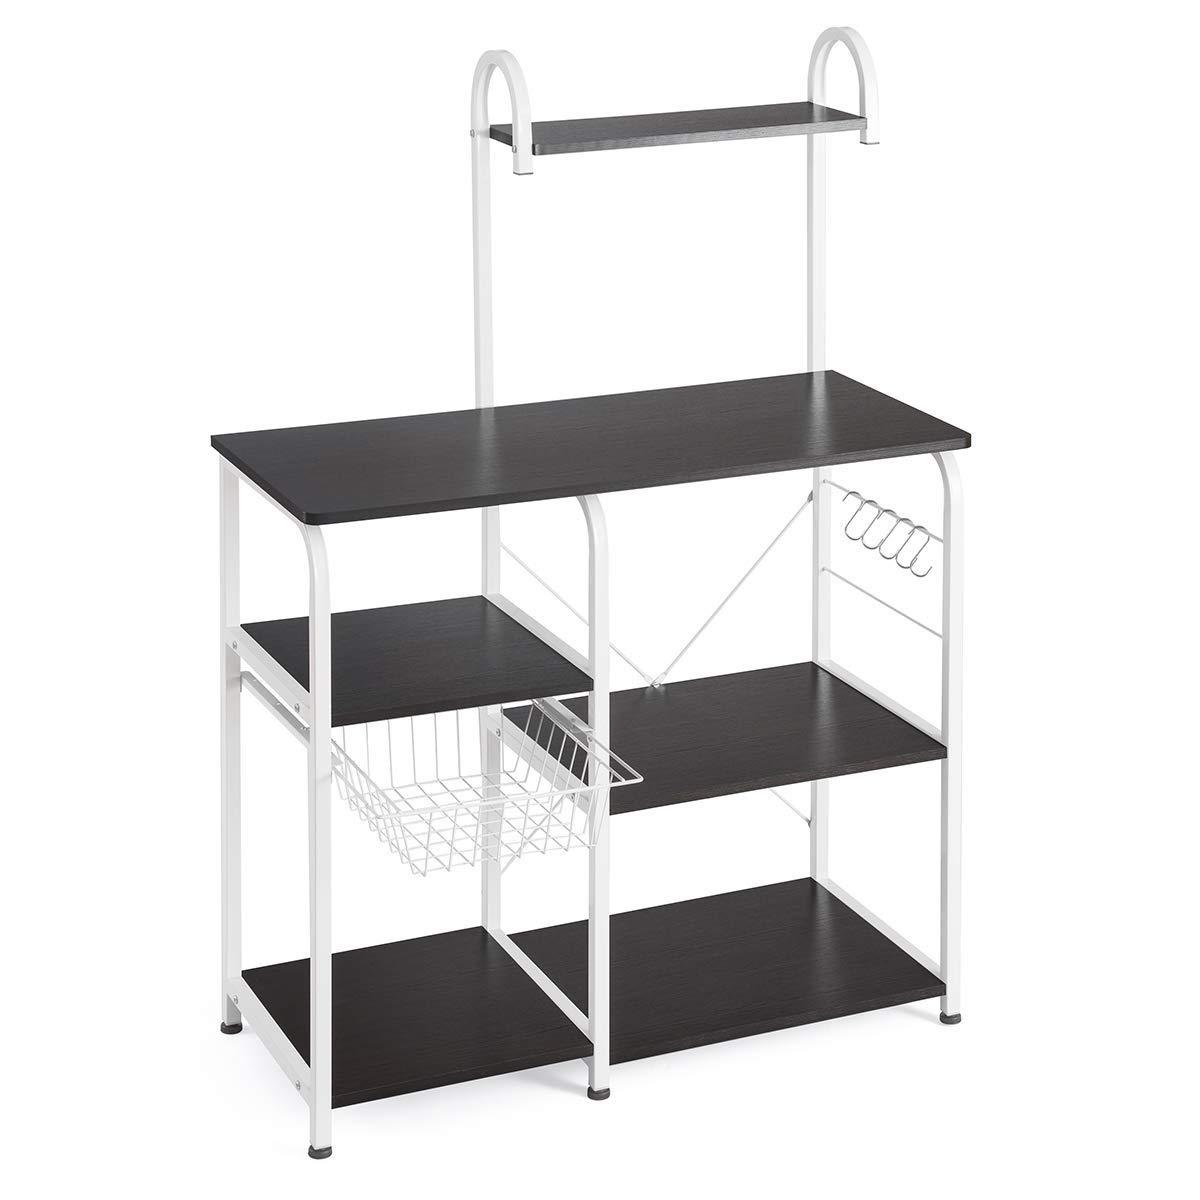 Shmei US Fast Shippment Multifunctional Kitchen Utility Storage Shelf 35.5'' Microwave Stand 4-Tier+3-Tier Shelf for Spice Rack Organizer Workstation for Home (Black)